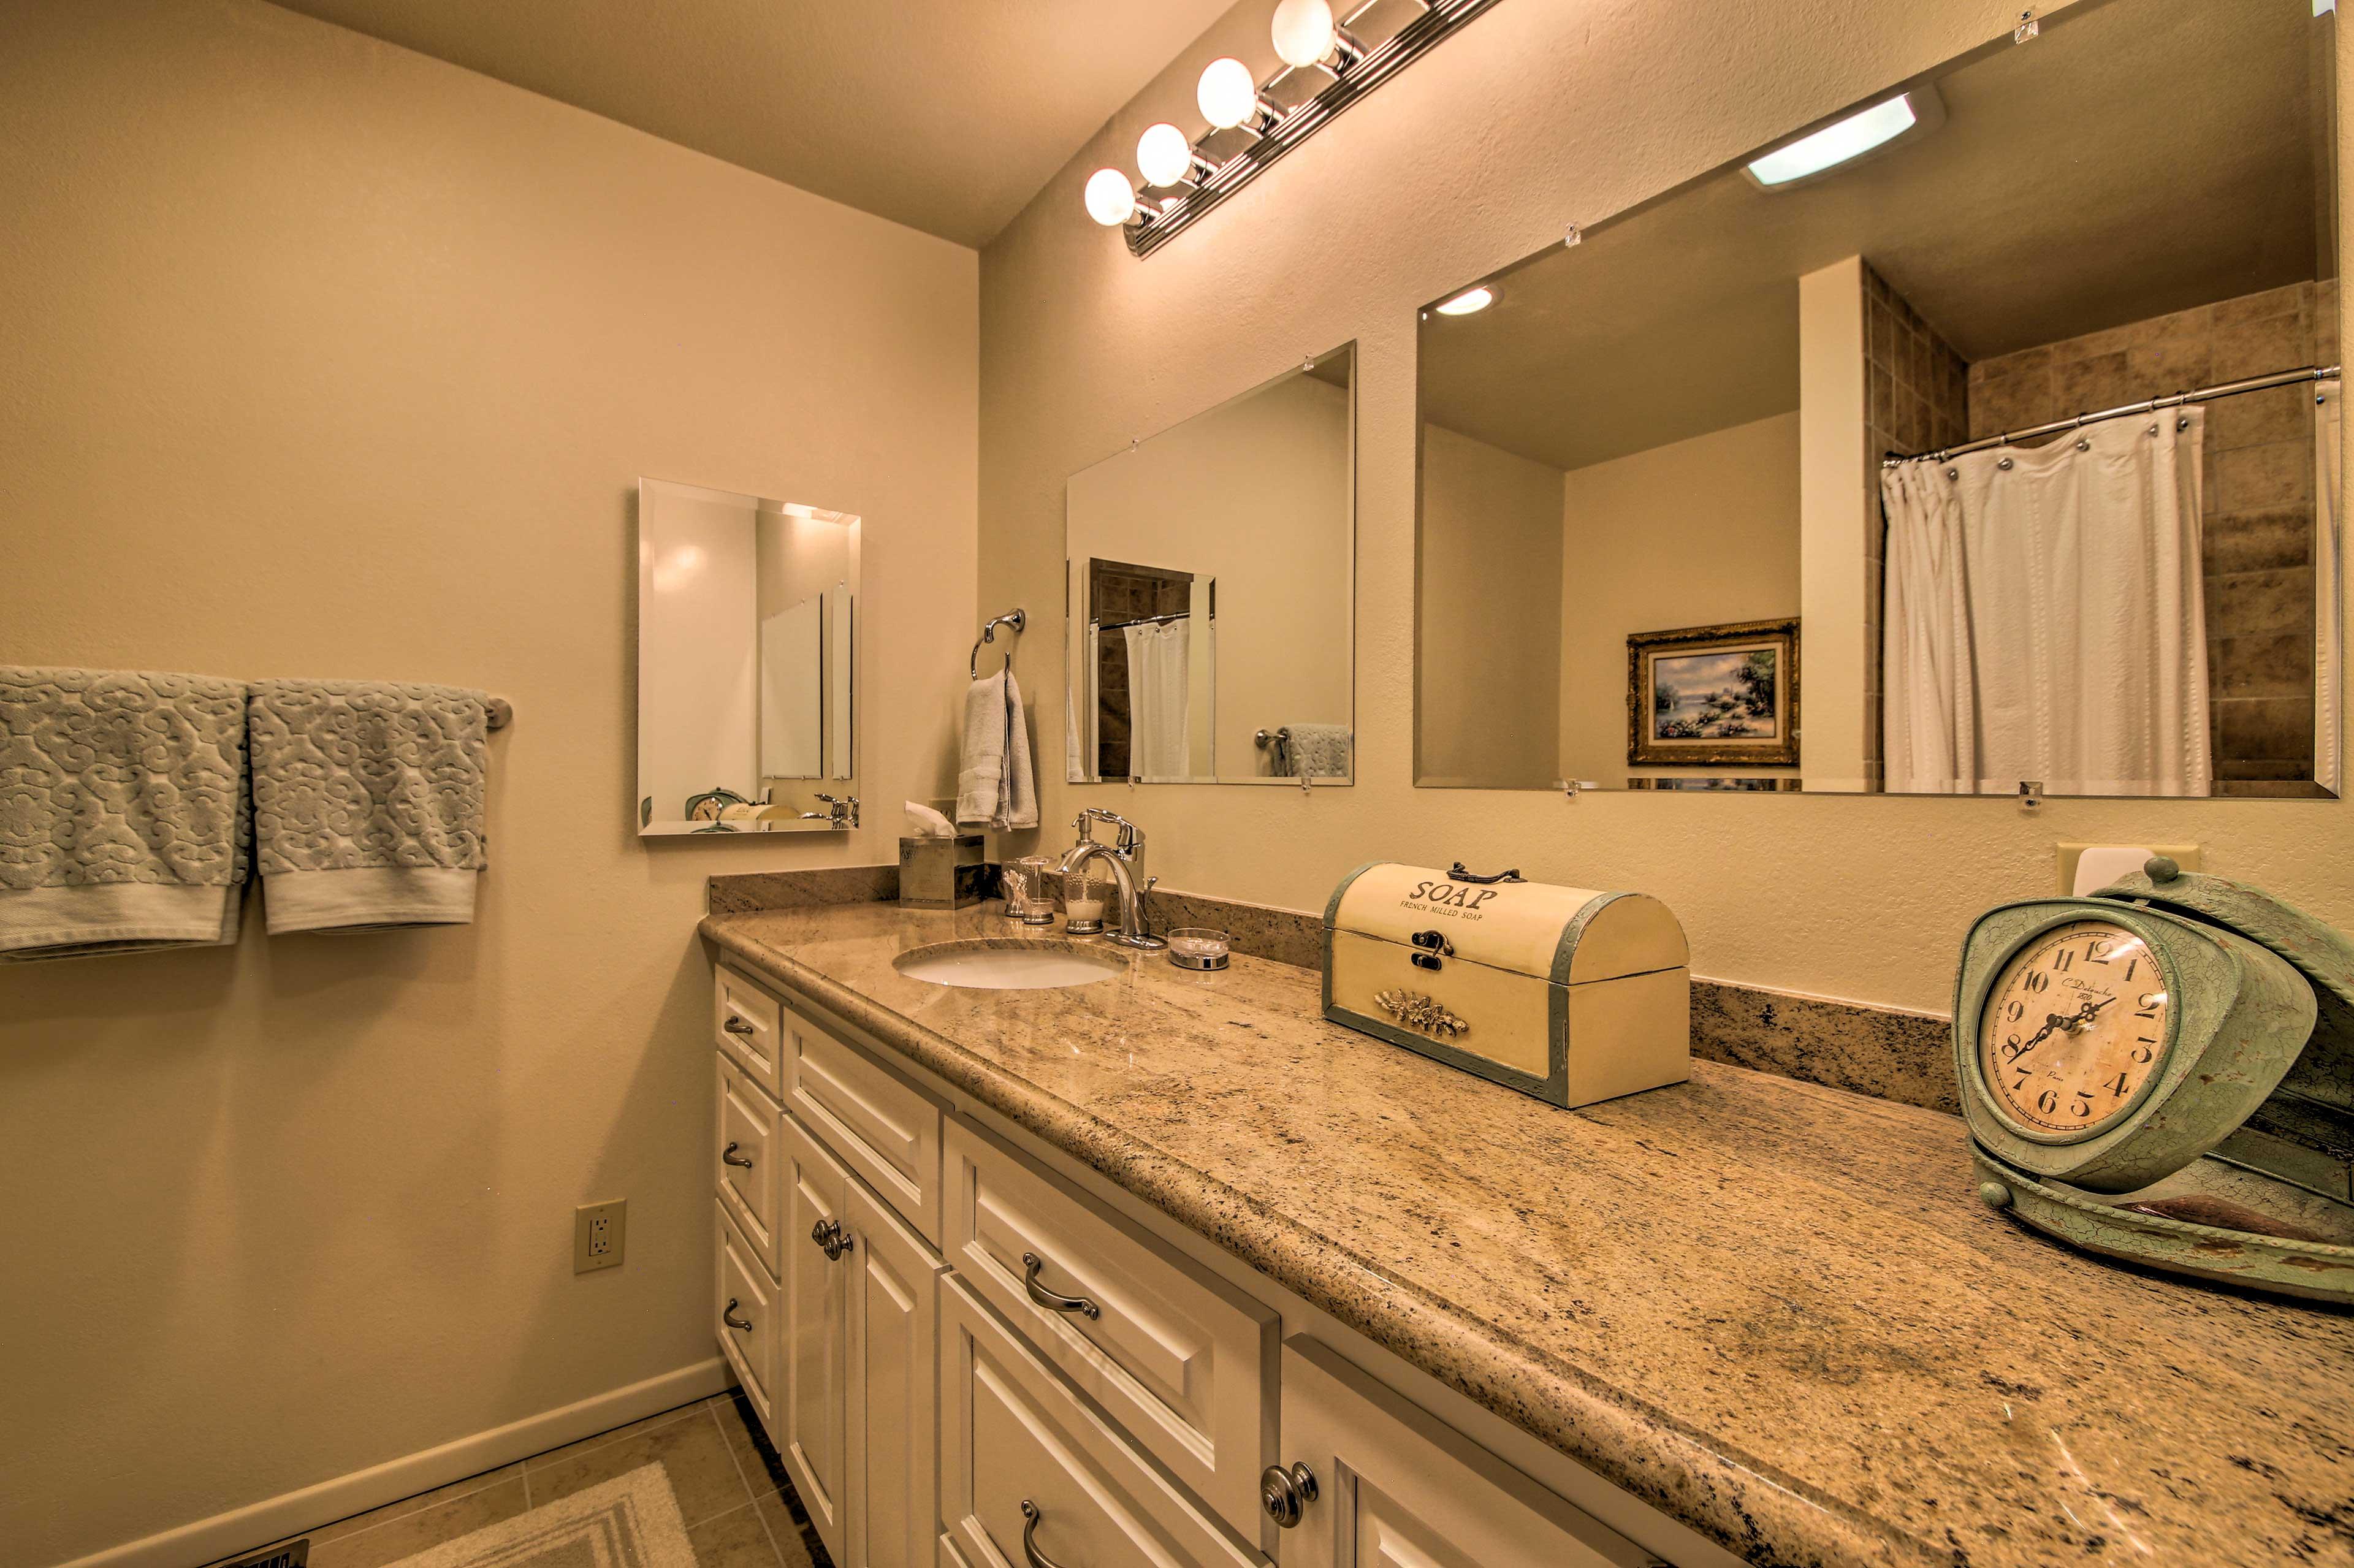 Take advantage of the convenient en-suite bathroom.